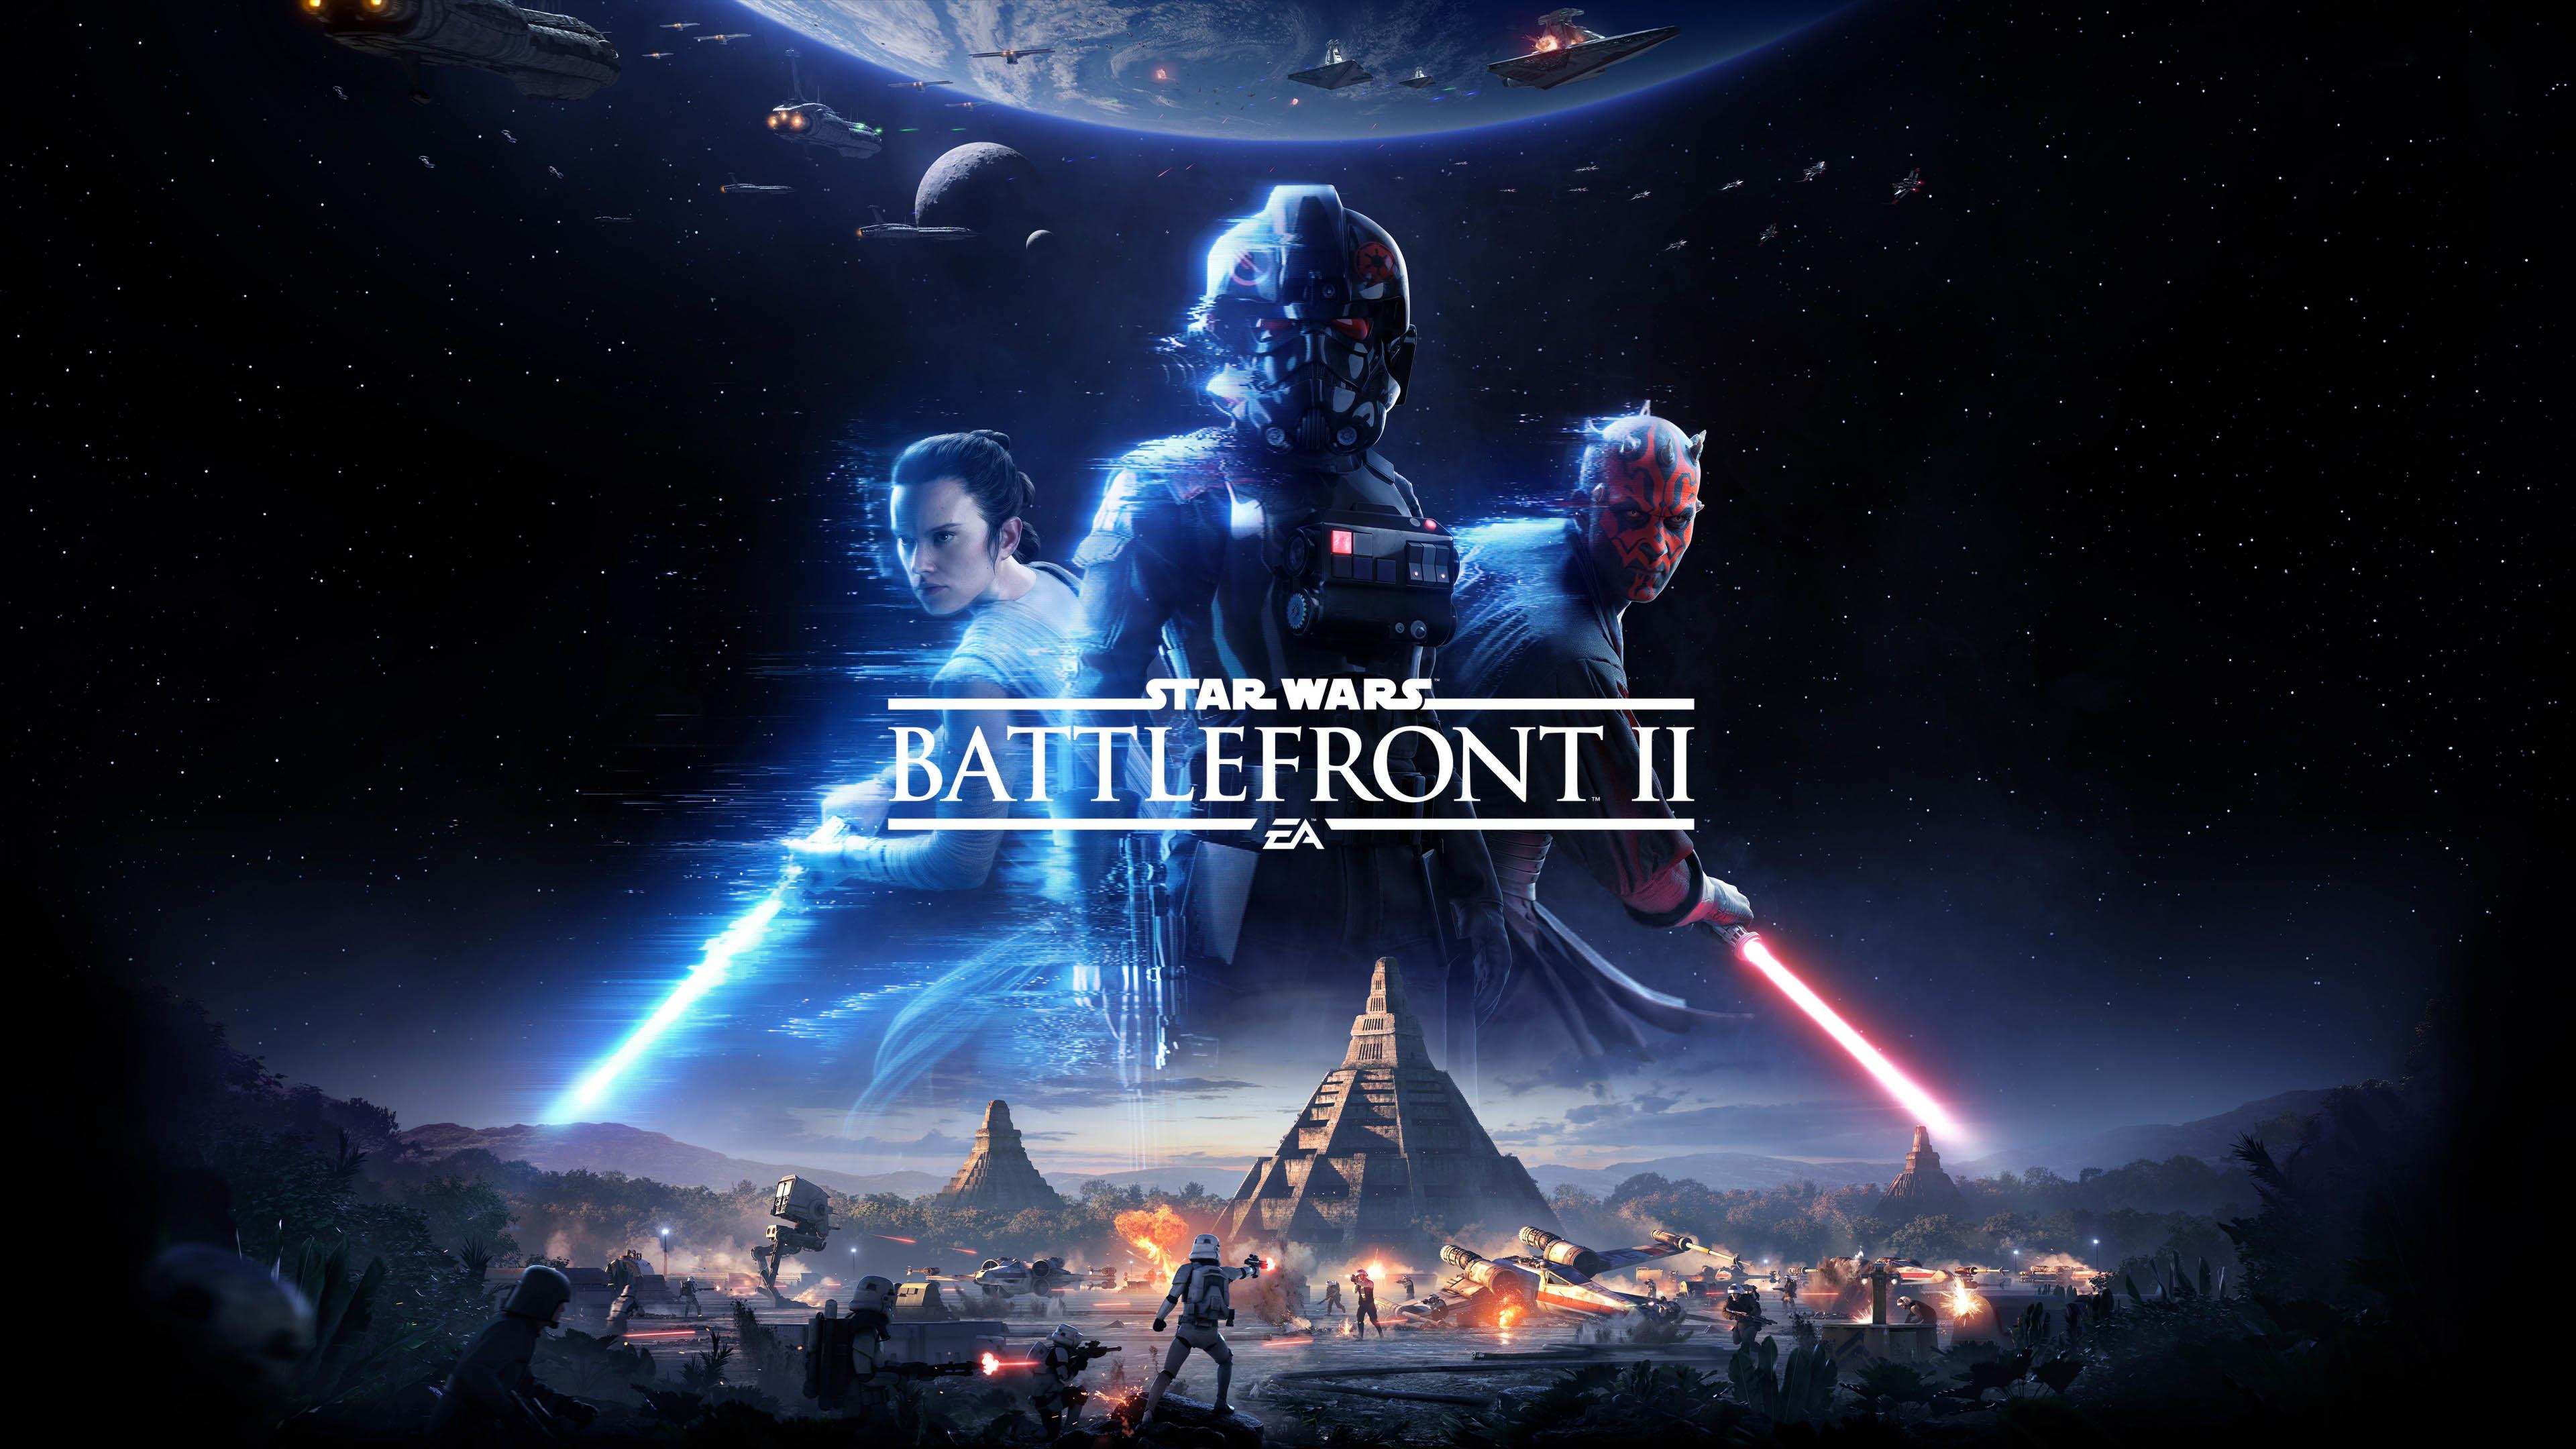 Star Wars: Battlefront II wallpaper